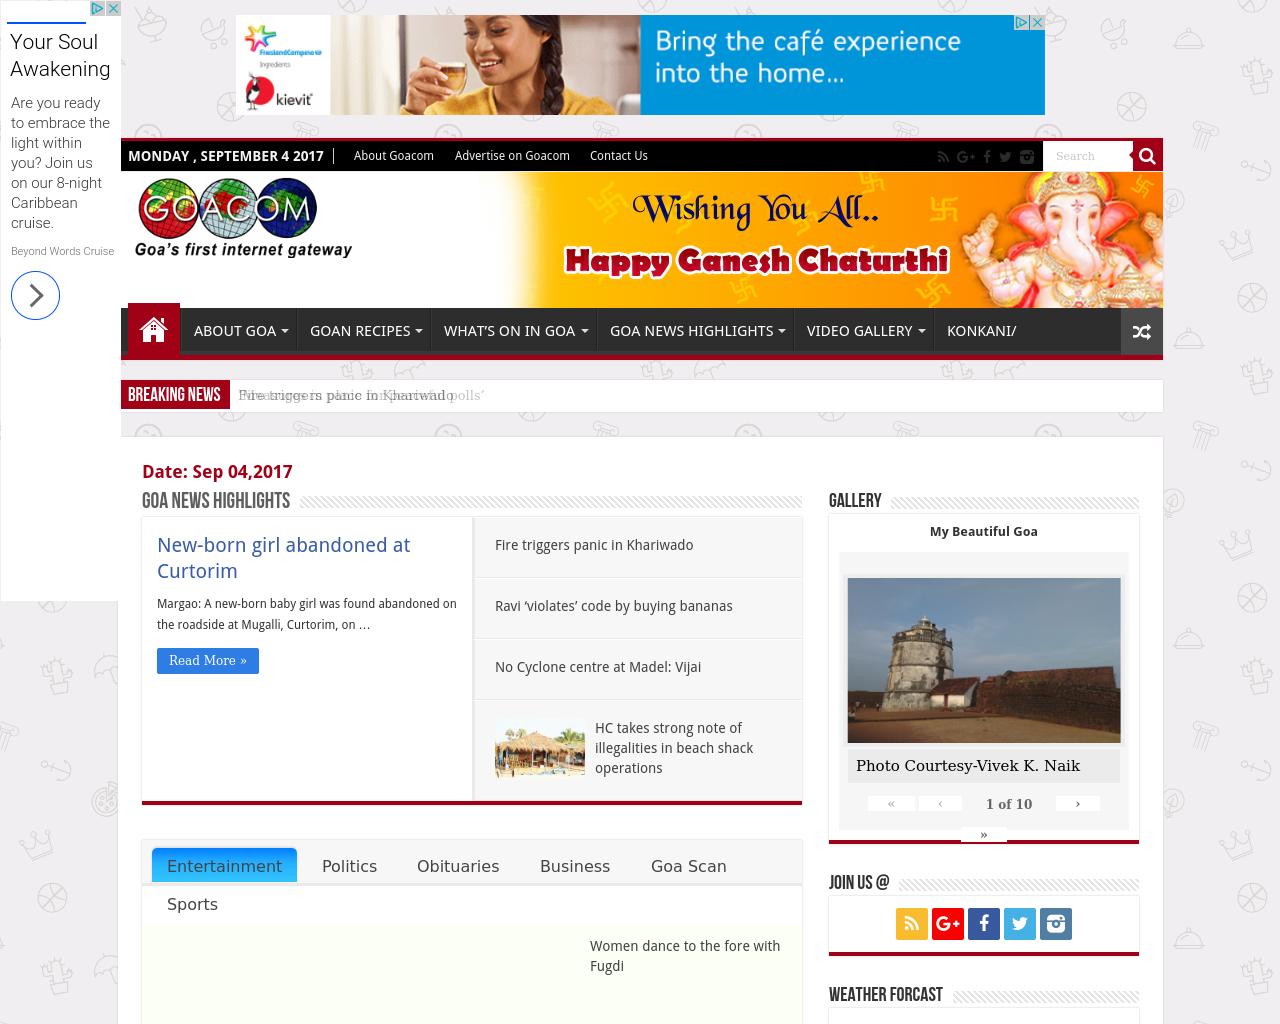 GoAcom-Advertising-Reviews-Pricing